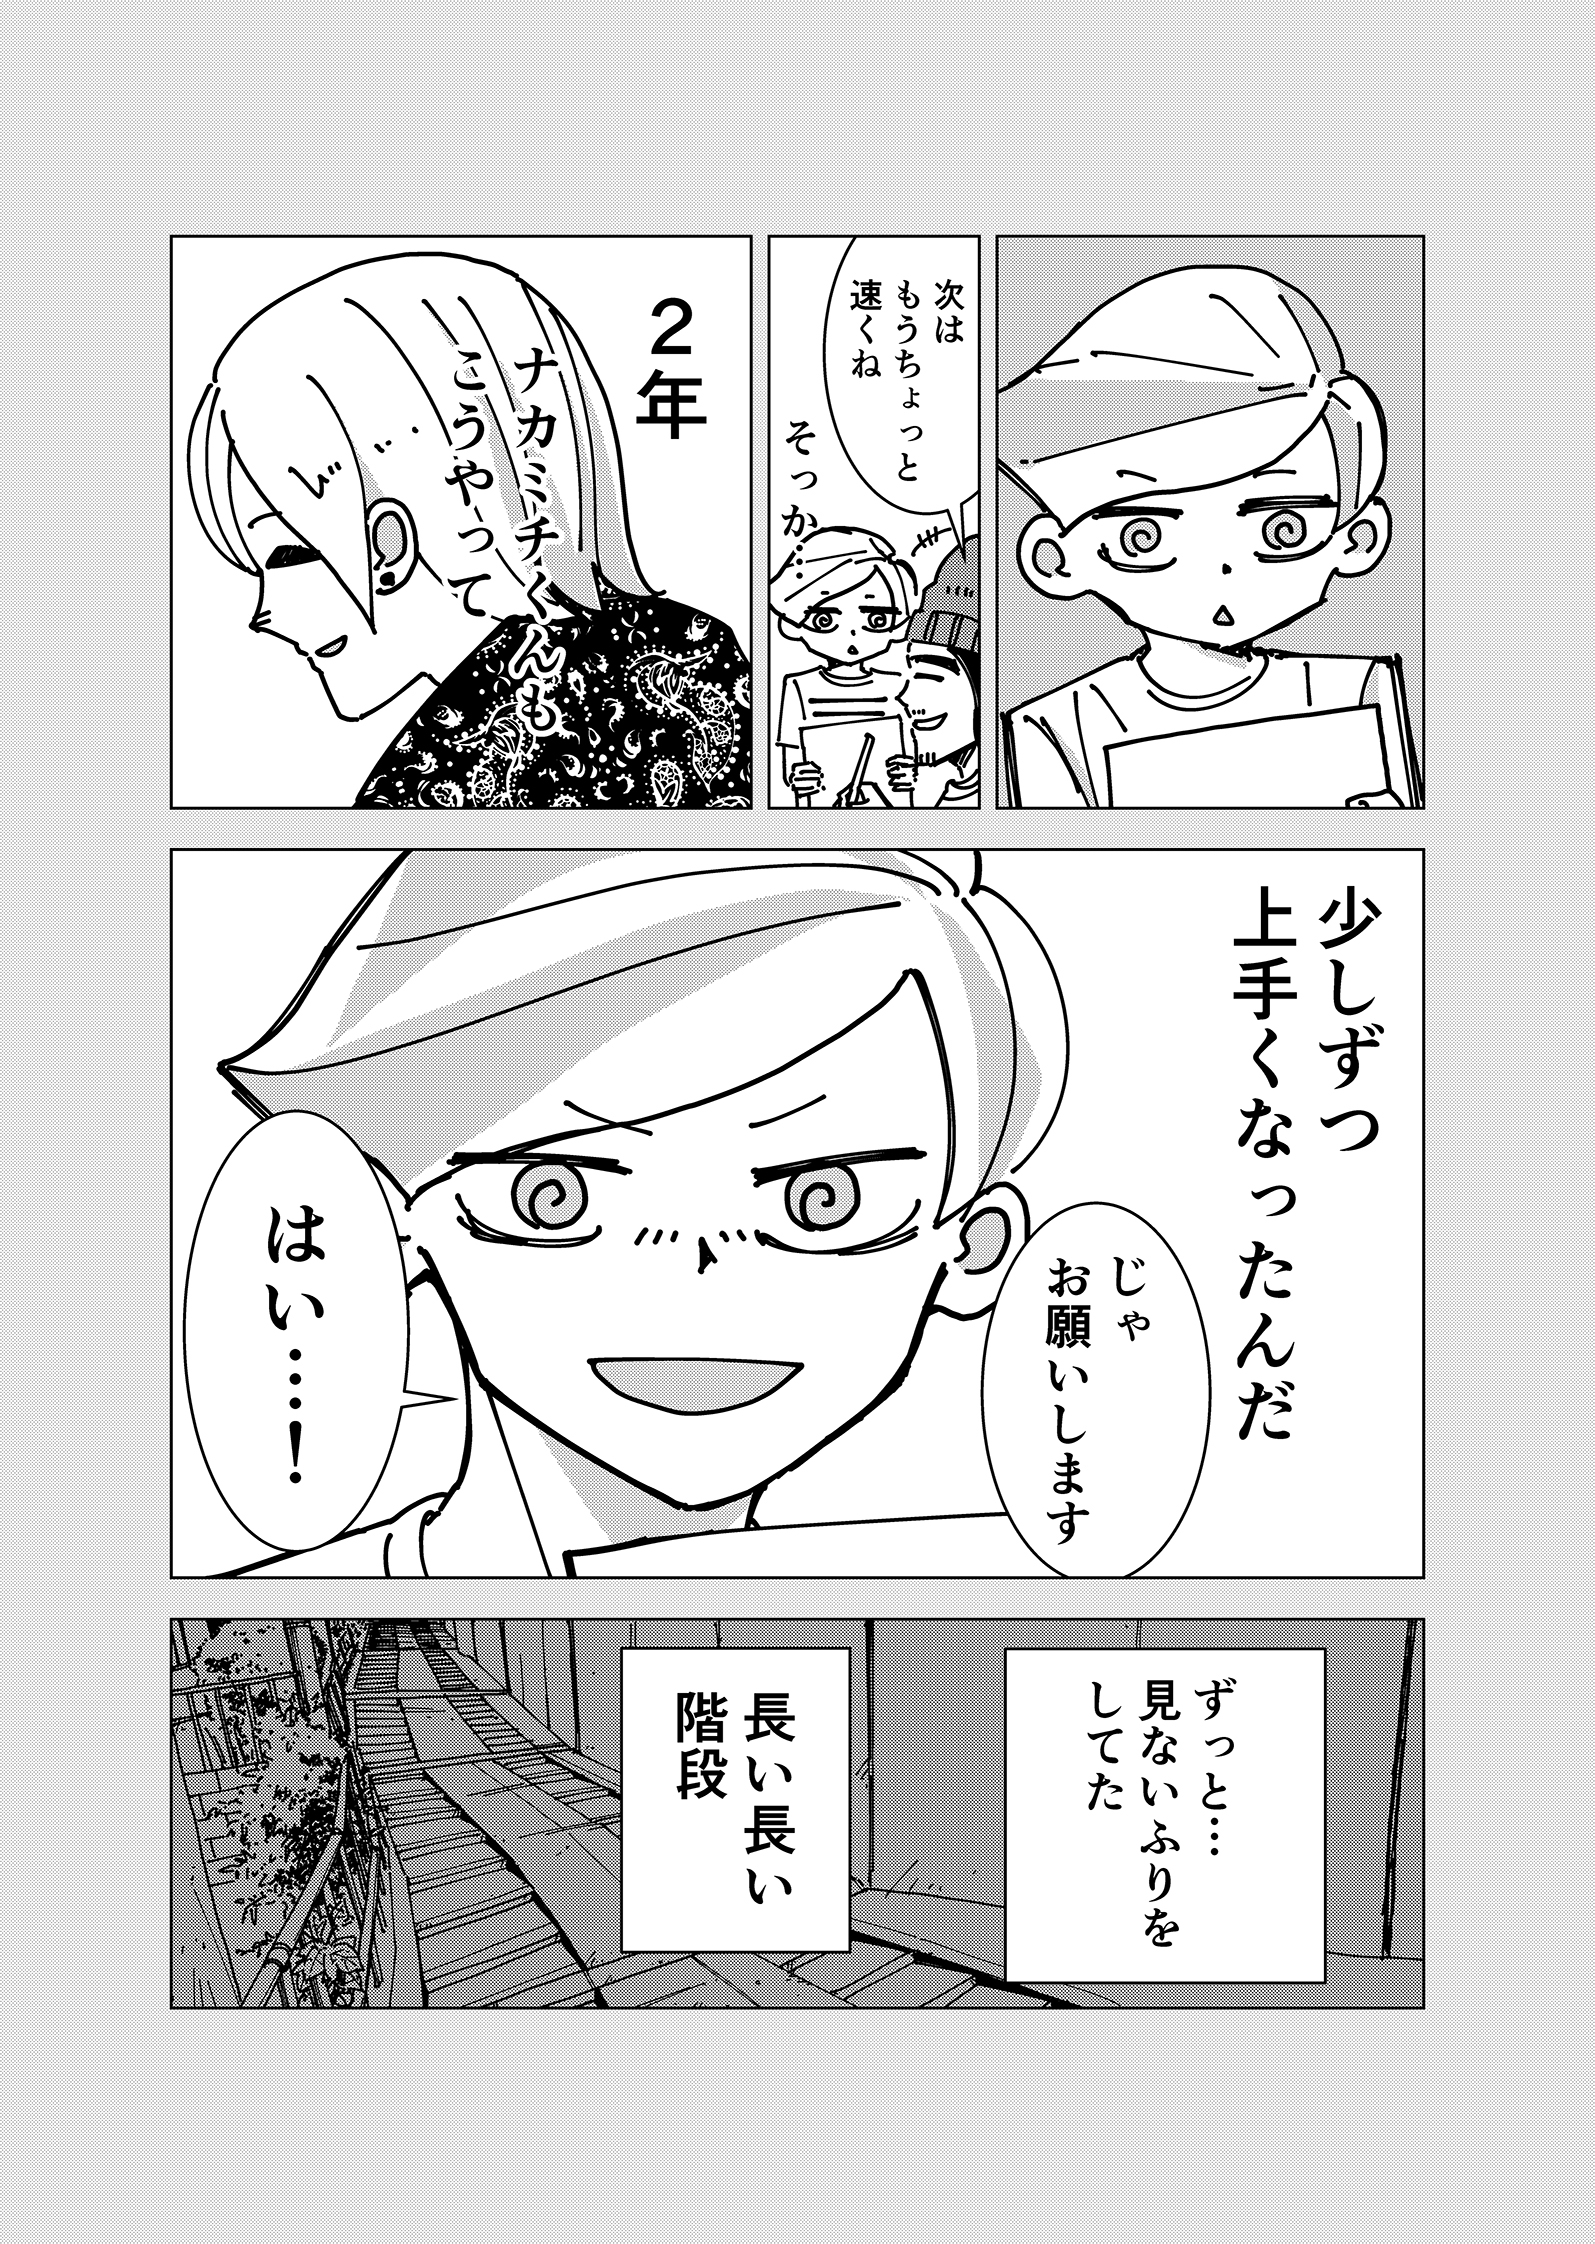 shareman01_011